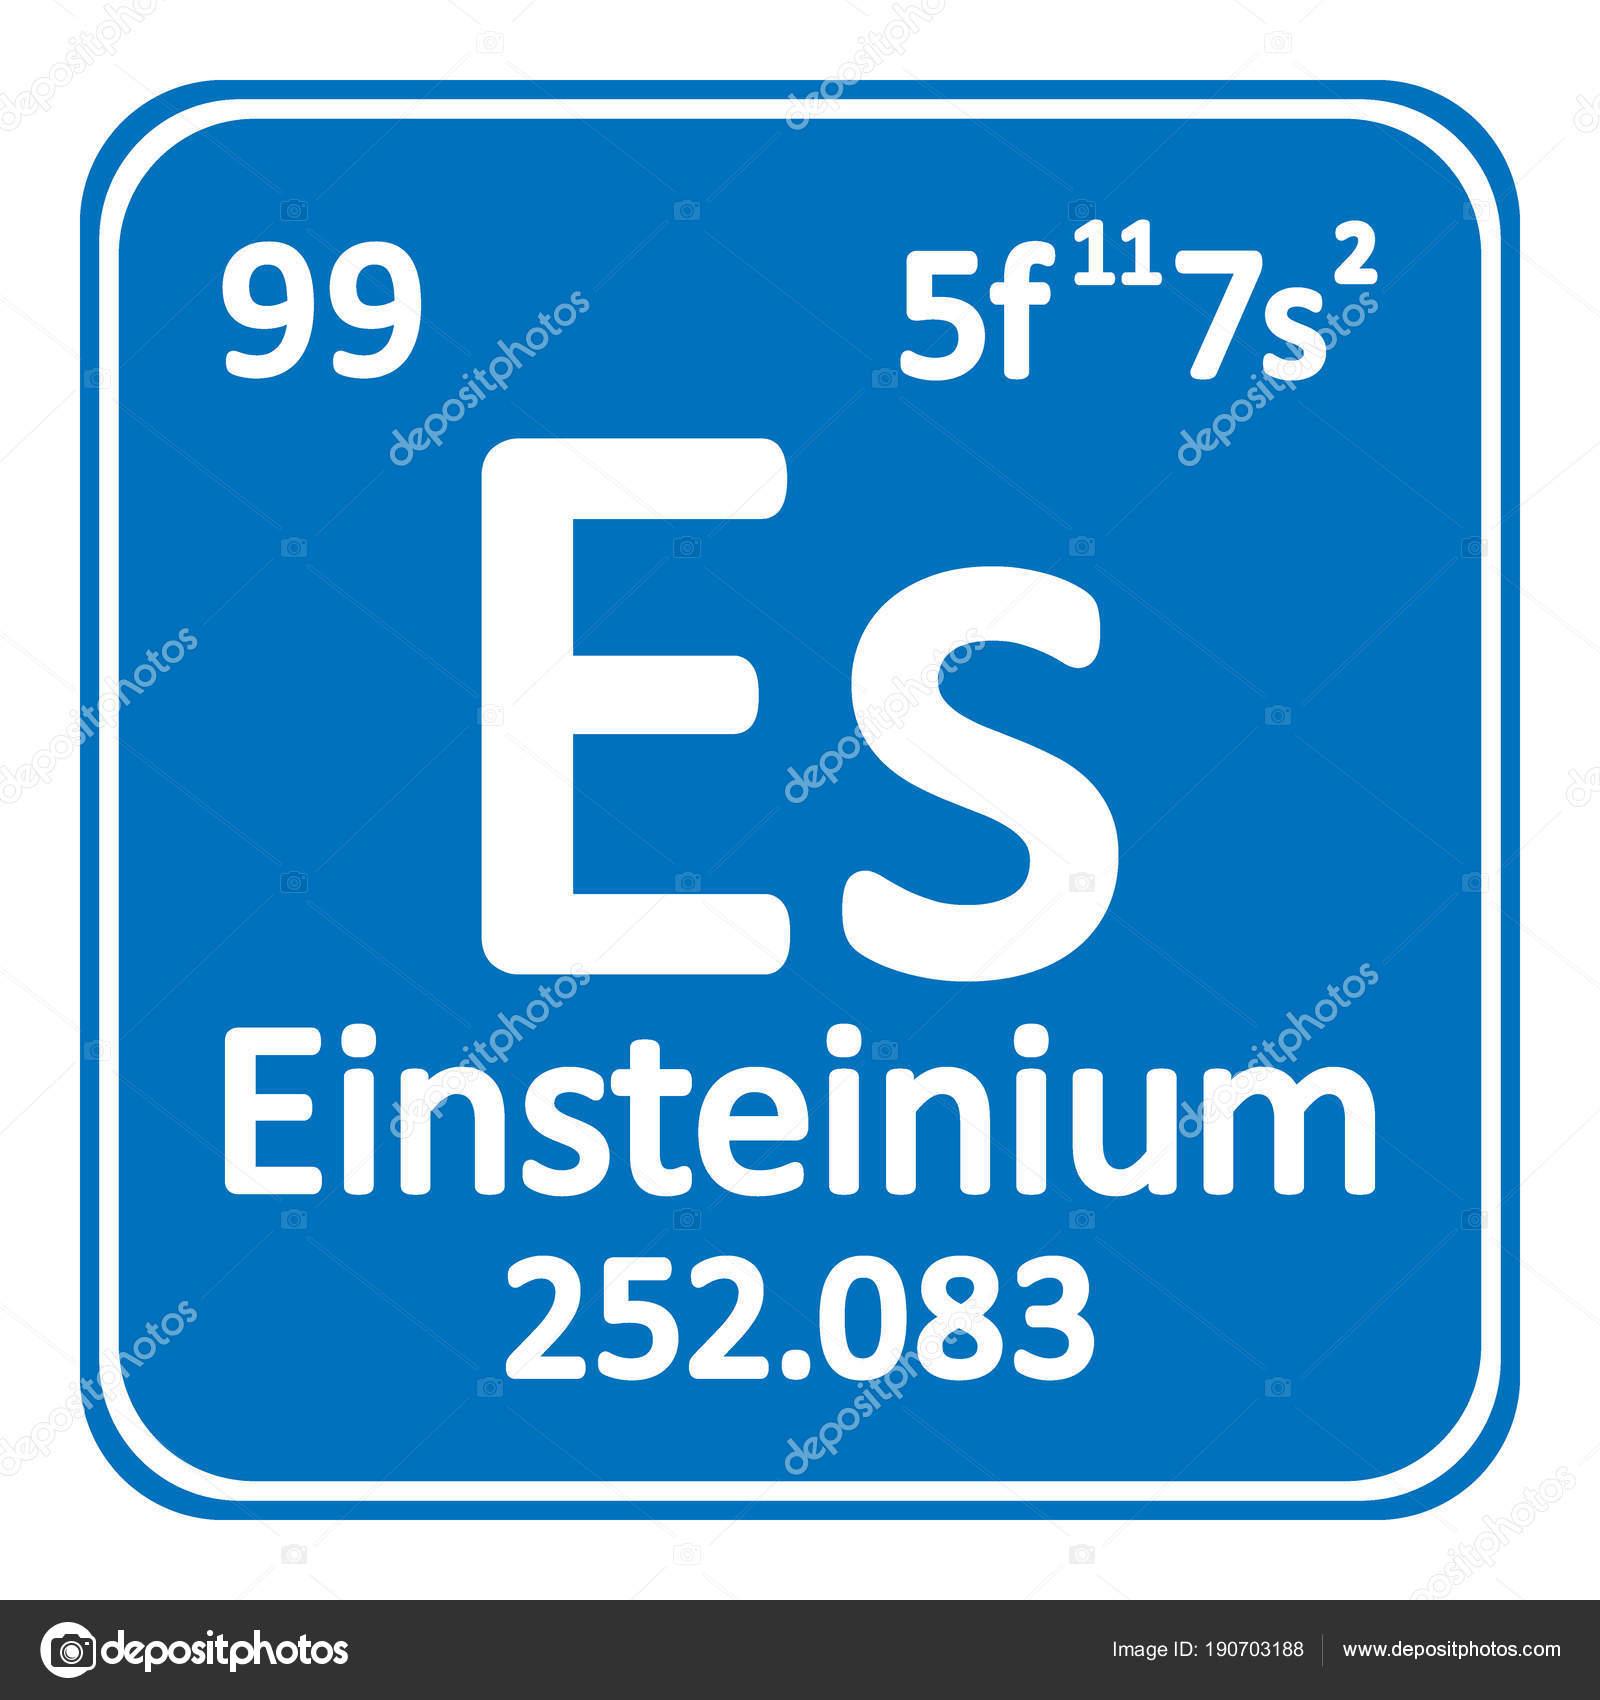 Icono de einstenio elemento tabla peridica archivo imgenes icono de einstenio elemento tabla peridica archivo imgenes vectoriales urtaz Images